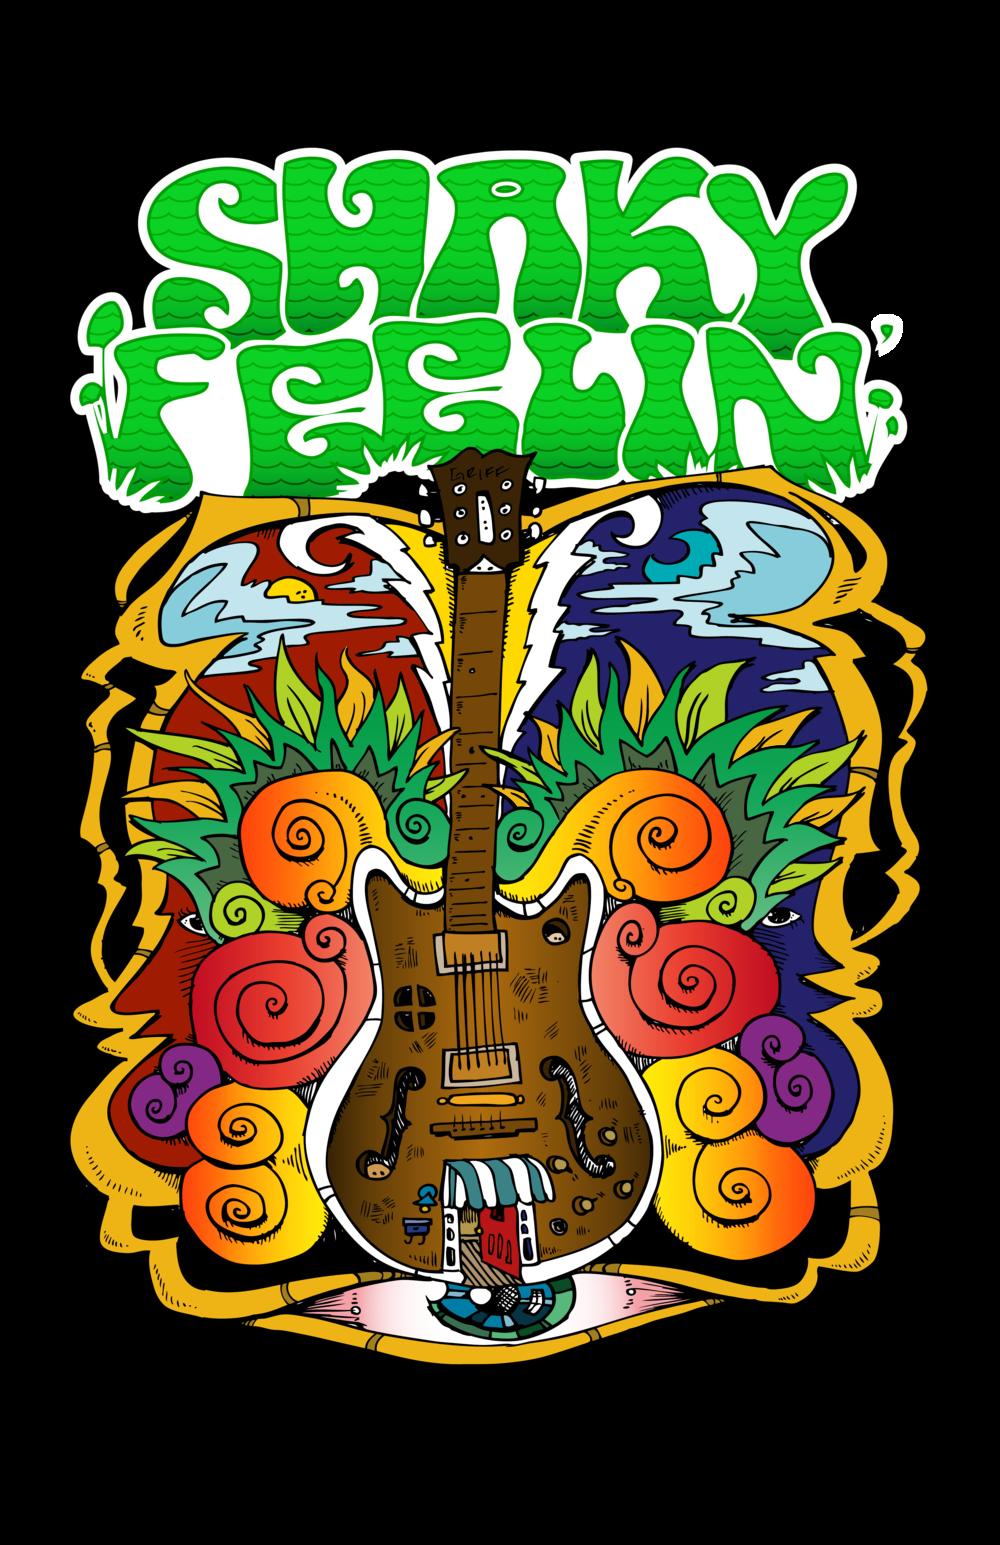 shaky guitar logo